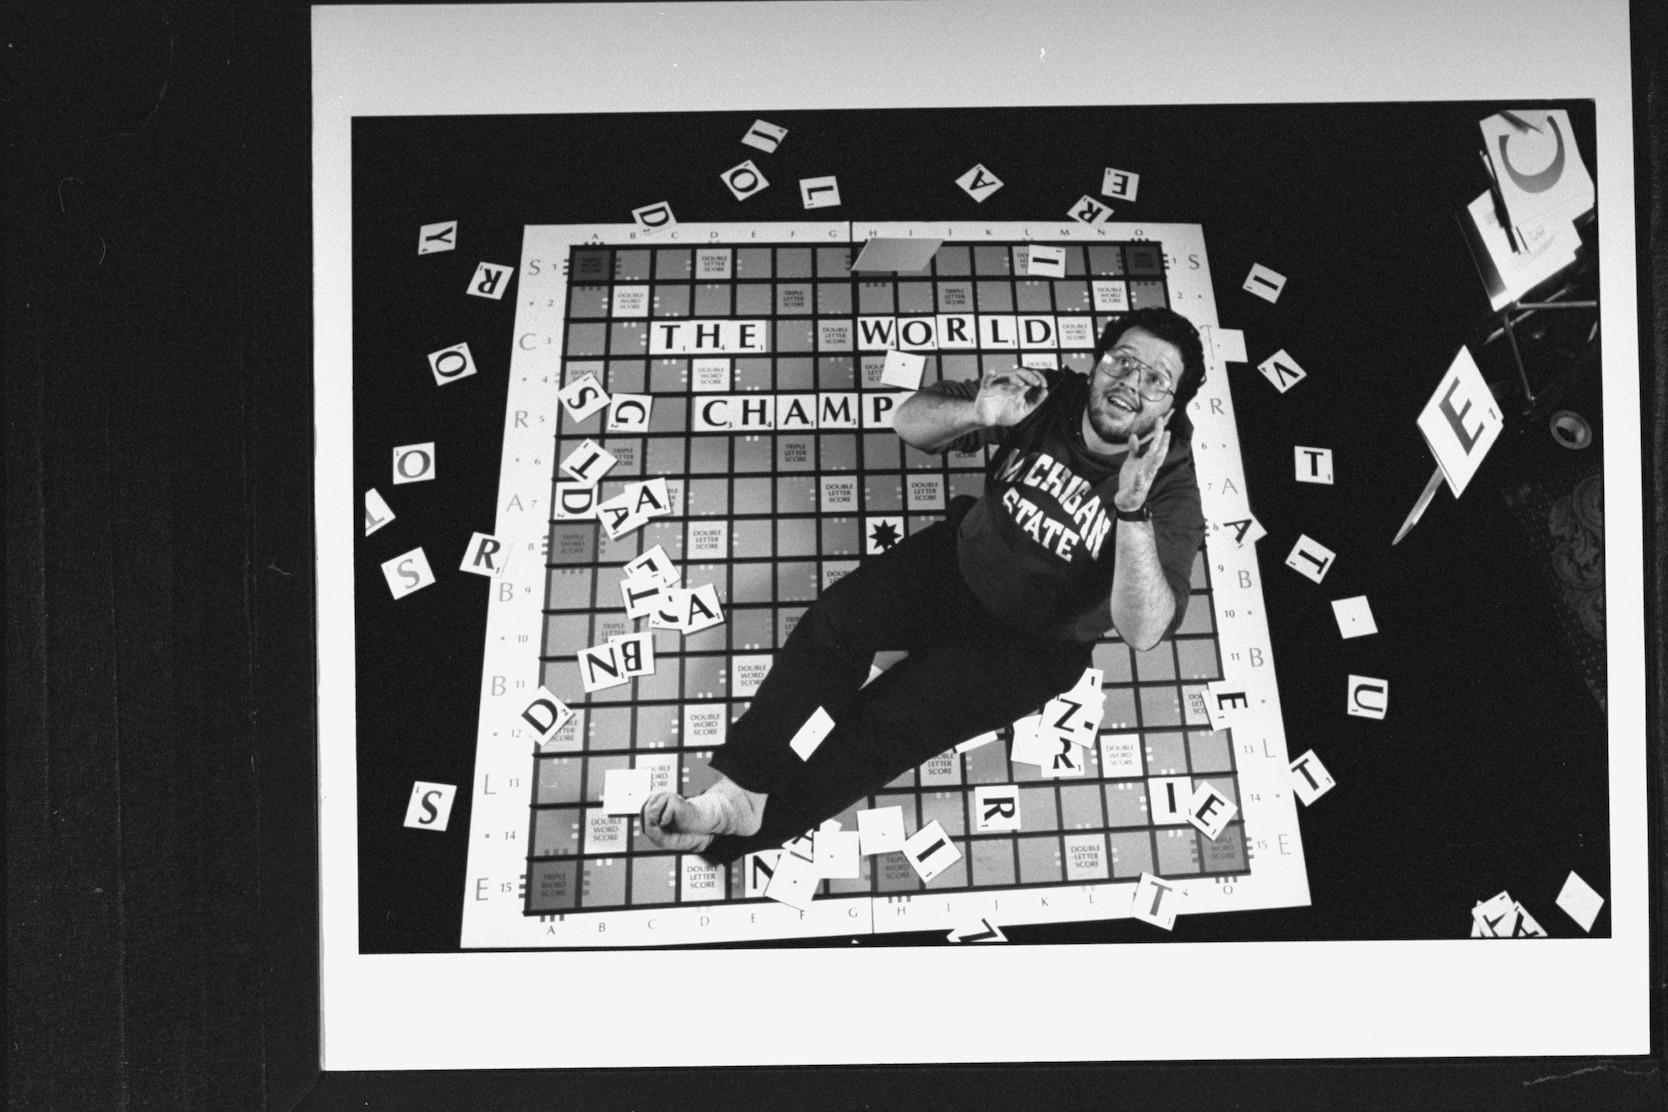 Peter Morris Scrabble world champion